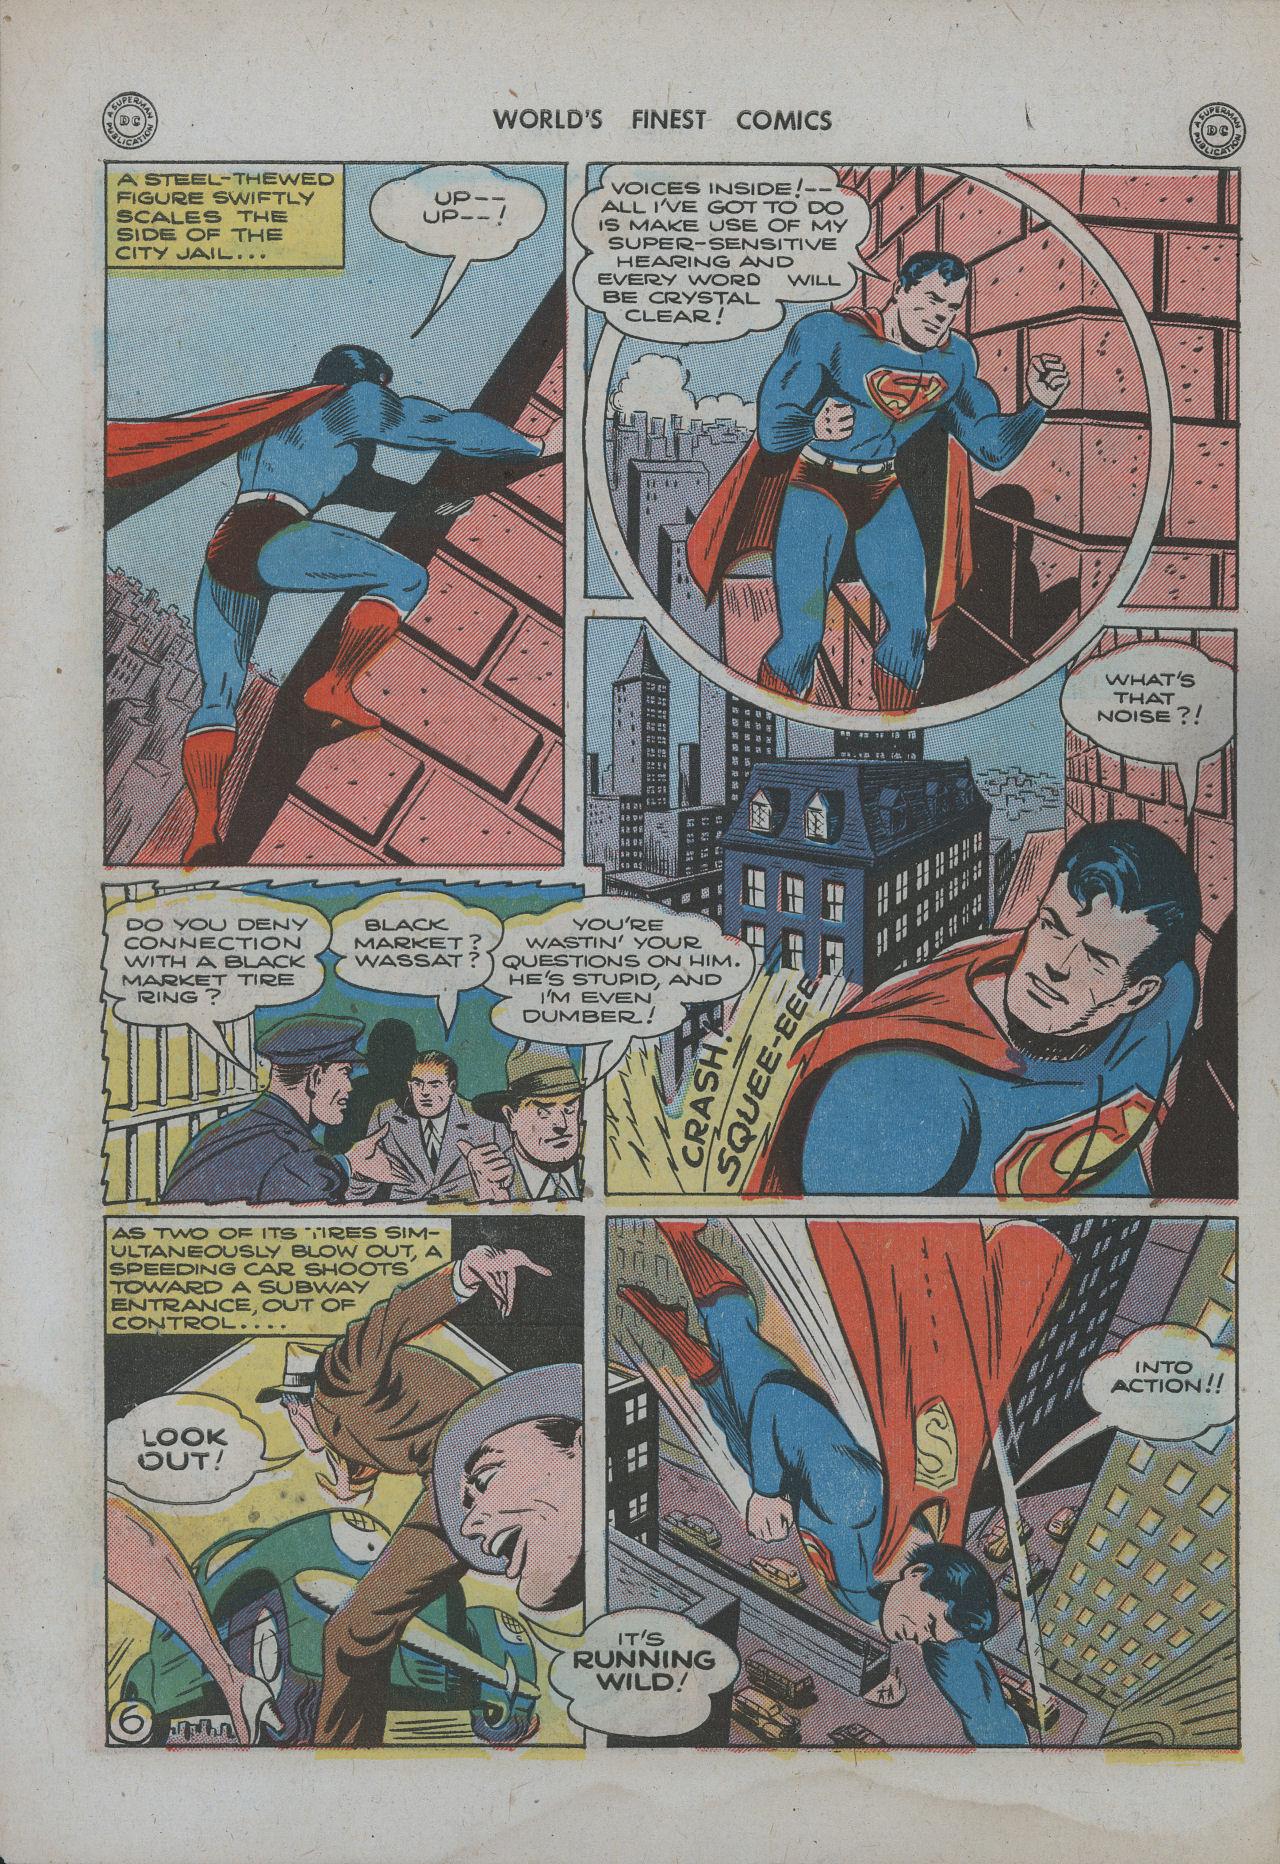 Read online World's Finest Comics comic -  Issue #15 - 9